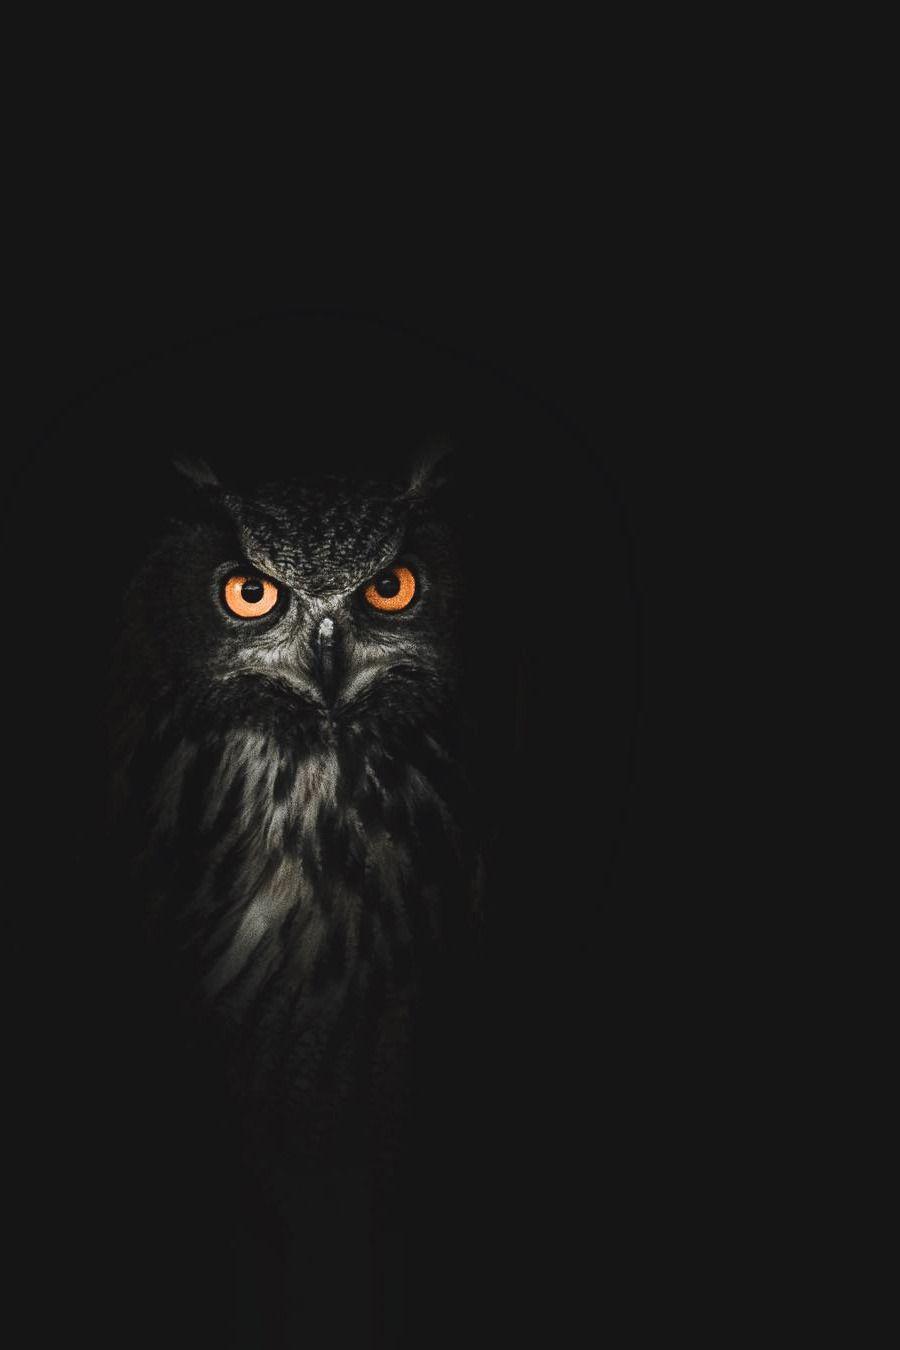 Lsleofskye The Eyes Tell More Than Words Could Ever Say Digital Editz Owl Wallpaper Owl Artwork Owl Pet